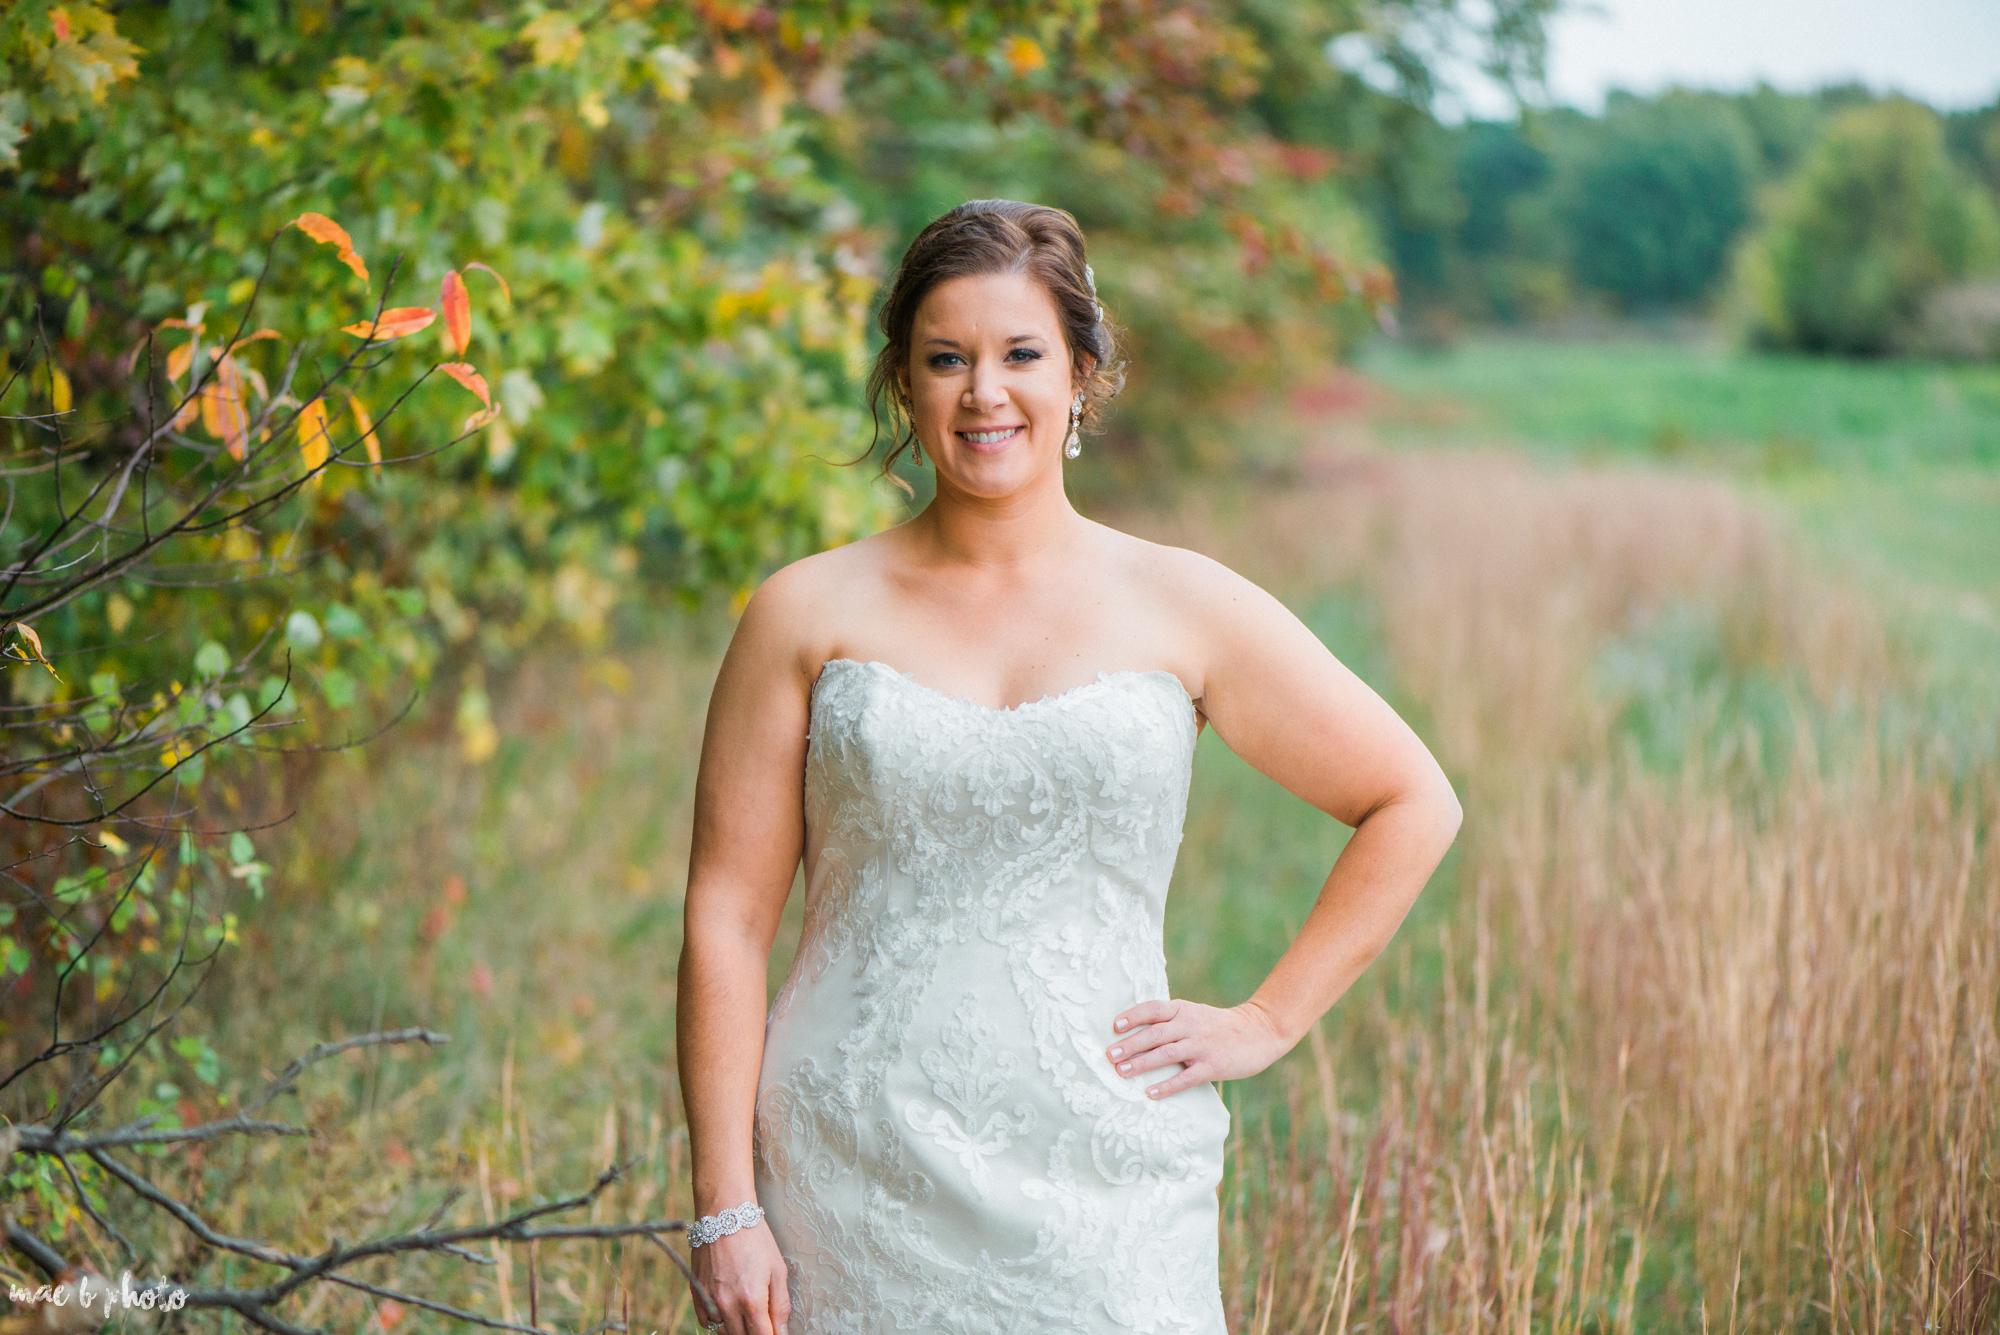 Sarah & Dustin's Rustic Chic Barn Wedding at Hartford Hill Winery in Hartford, Ohio by Mae B Photo-76.jpg